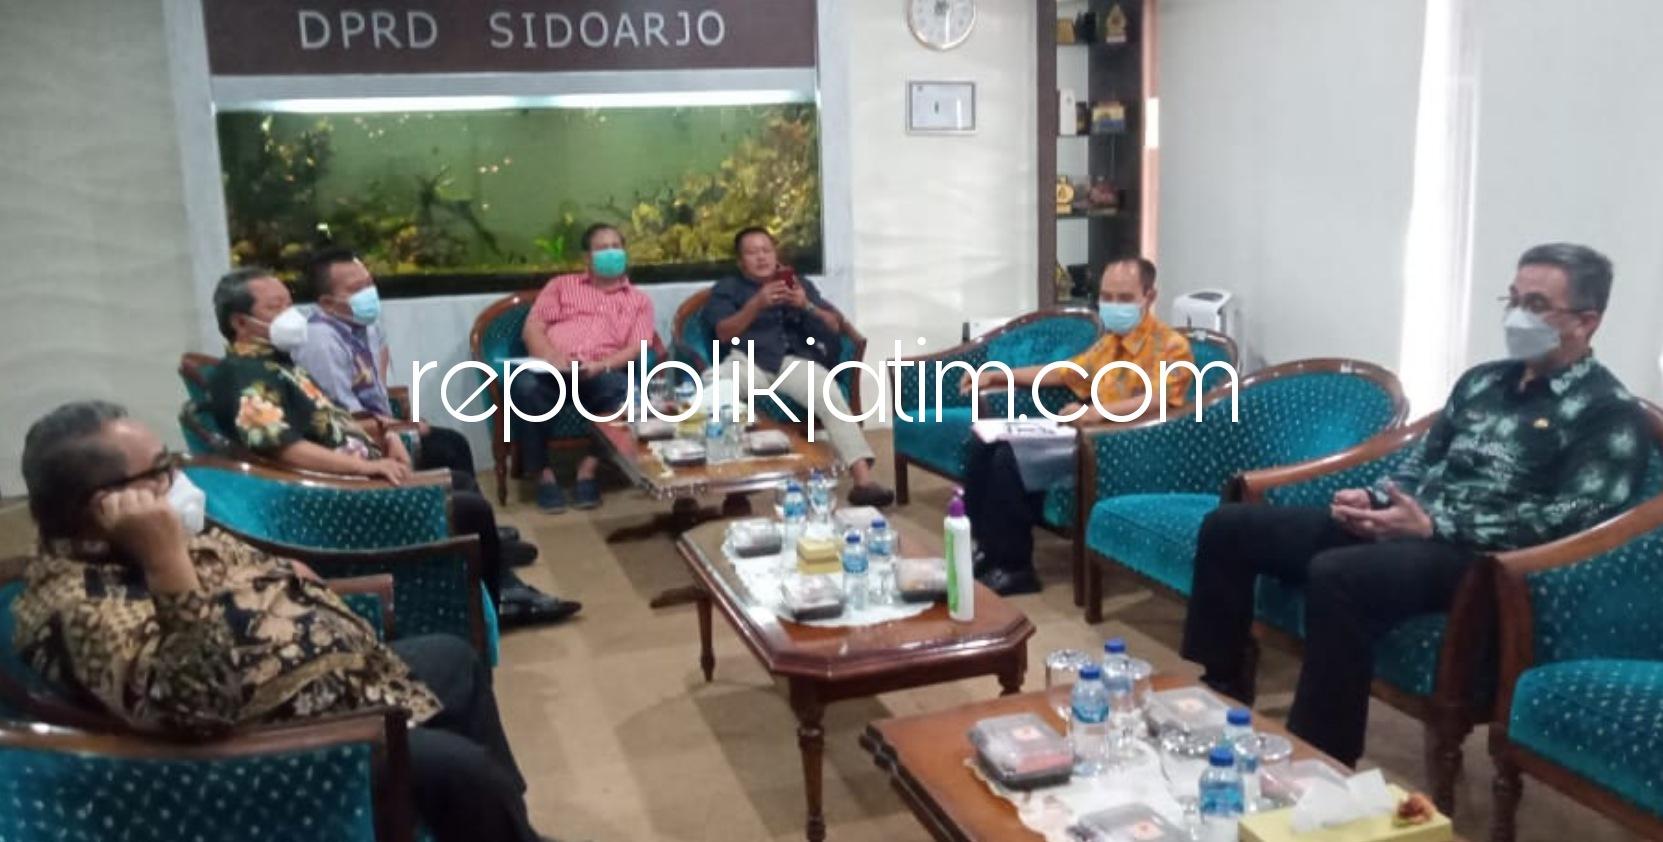 Dianaktirikan Jalan dan Infrastruktur Rusak Tak Diperbaiki, Dewan Desak Pemekaran Wilayah Sidoarjo Barat